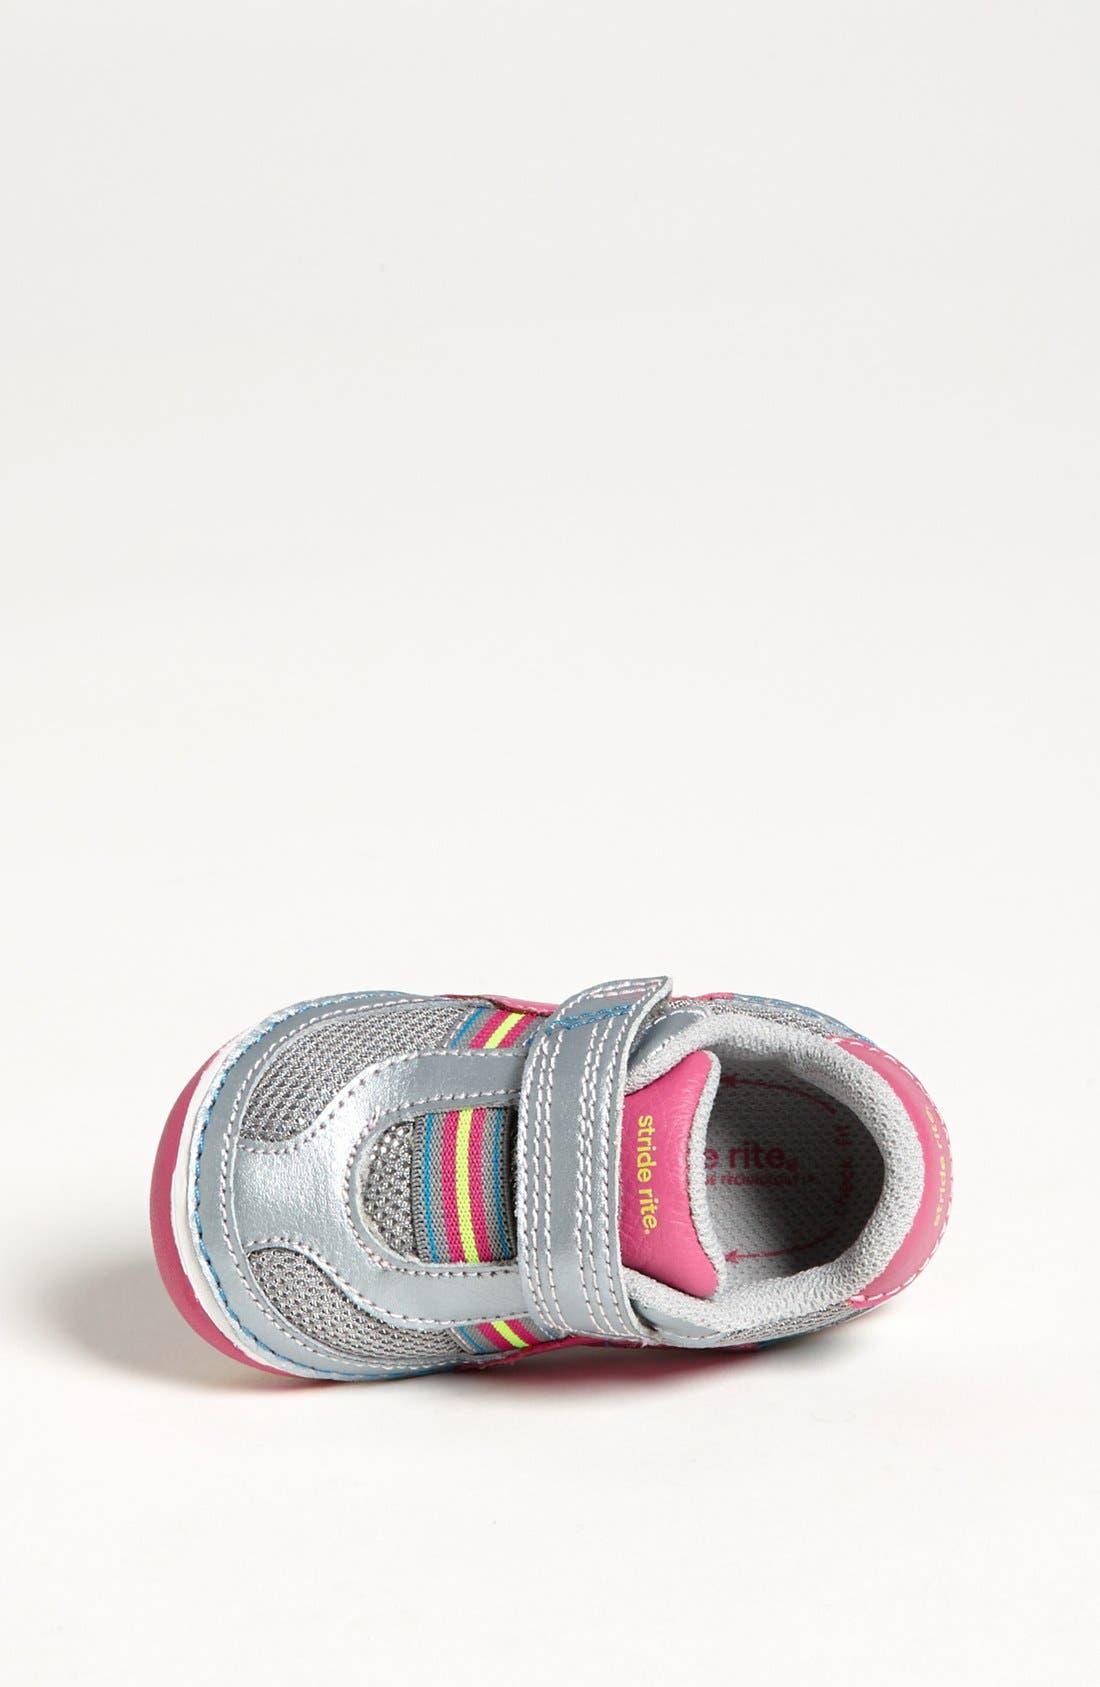 Alternate Image 3  - Stride Rite 'Aldrin' Sneaker (Baby & Walker)